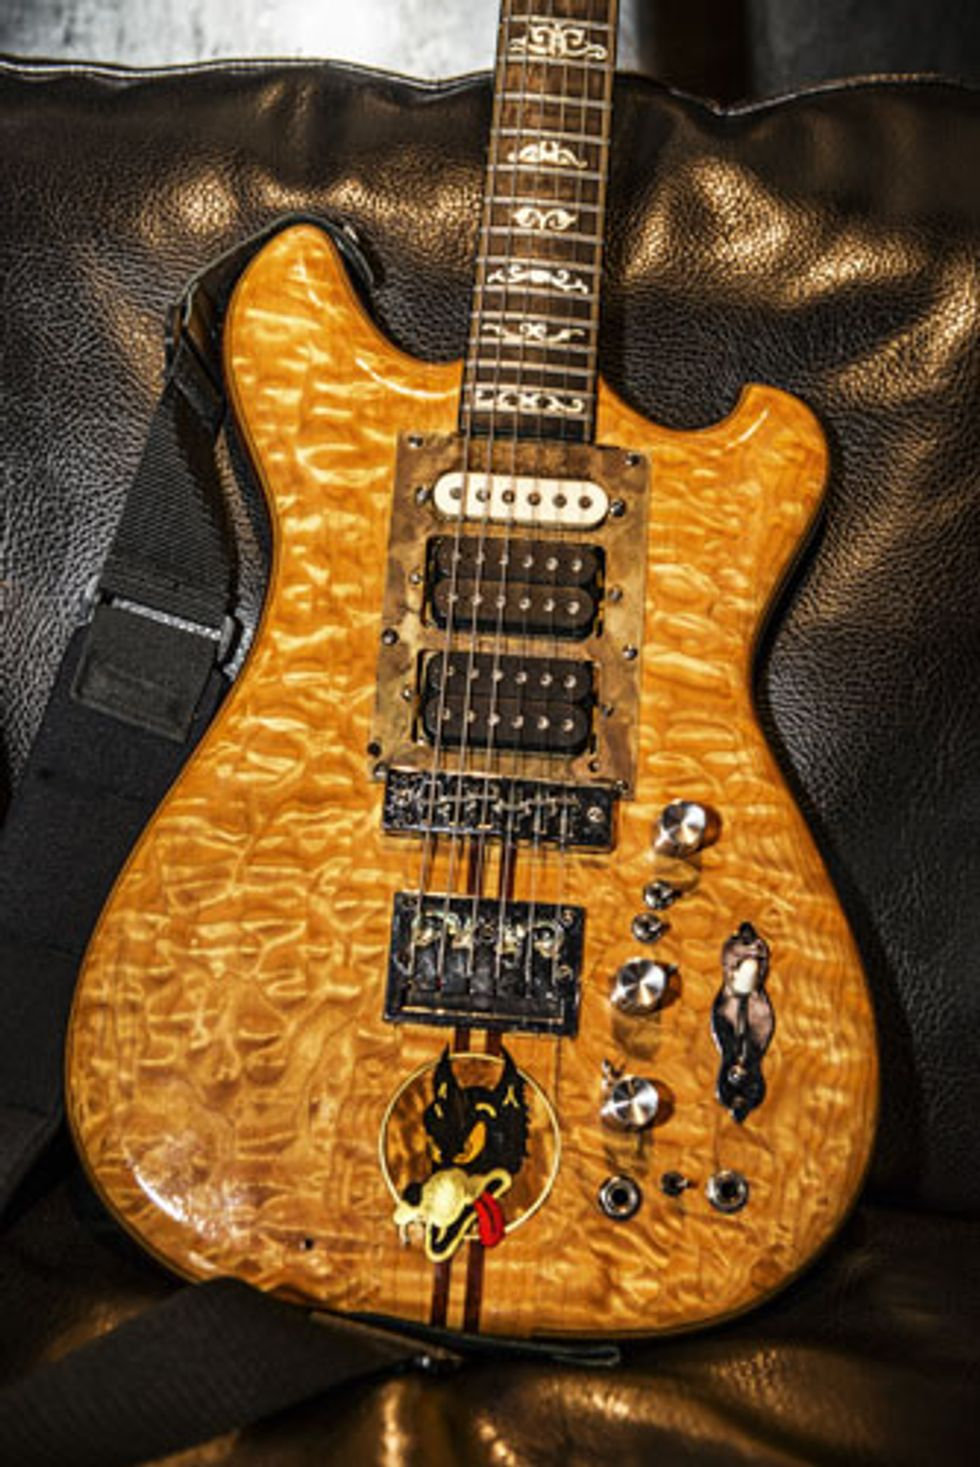 guitars that jam book excerpt premier guitar. Black Bedroom Furniture Sets. Home Design Ideas